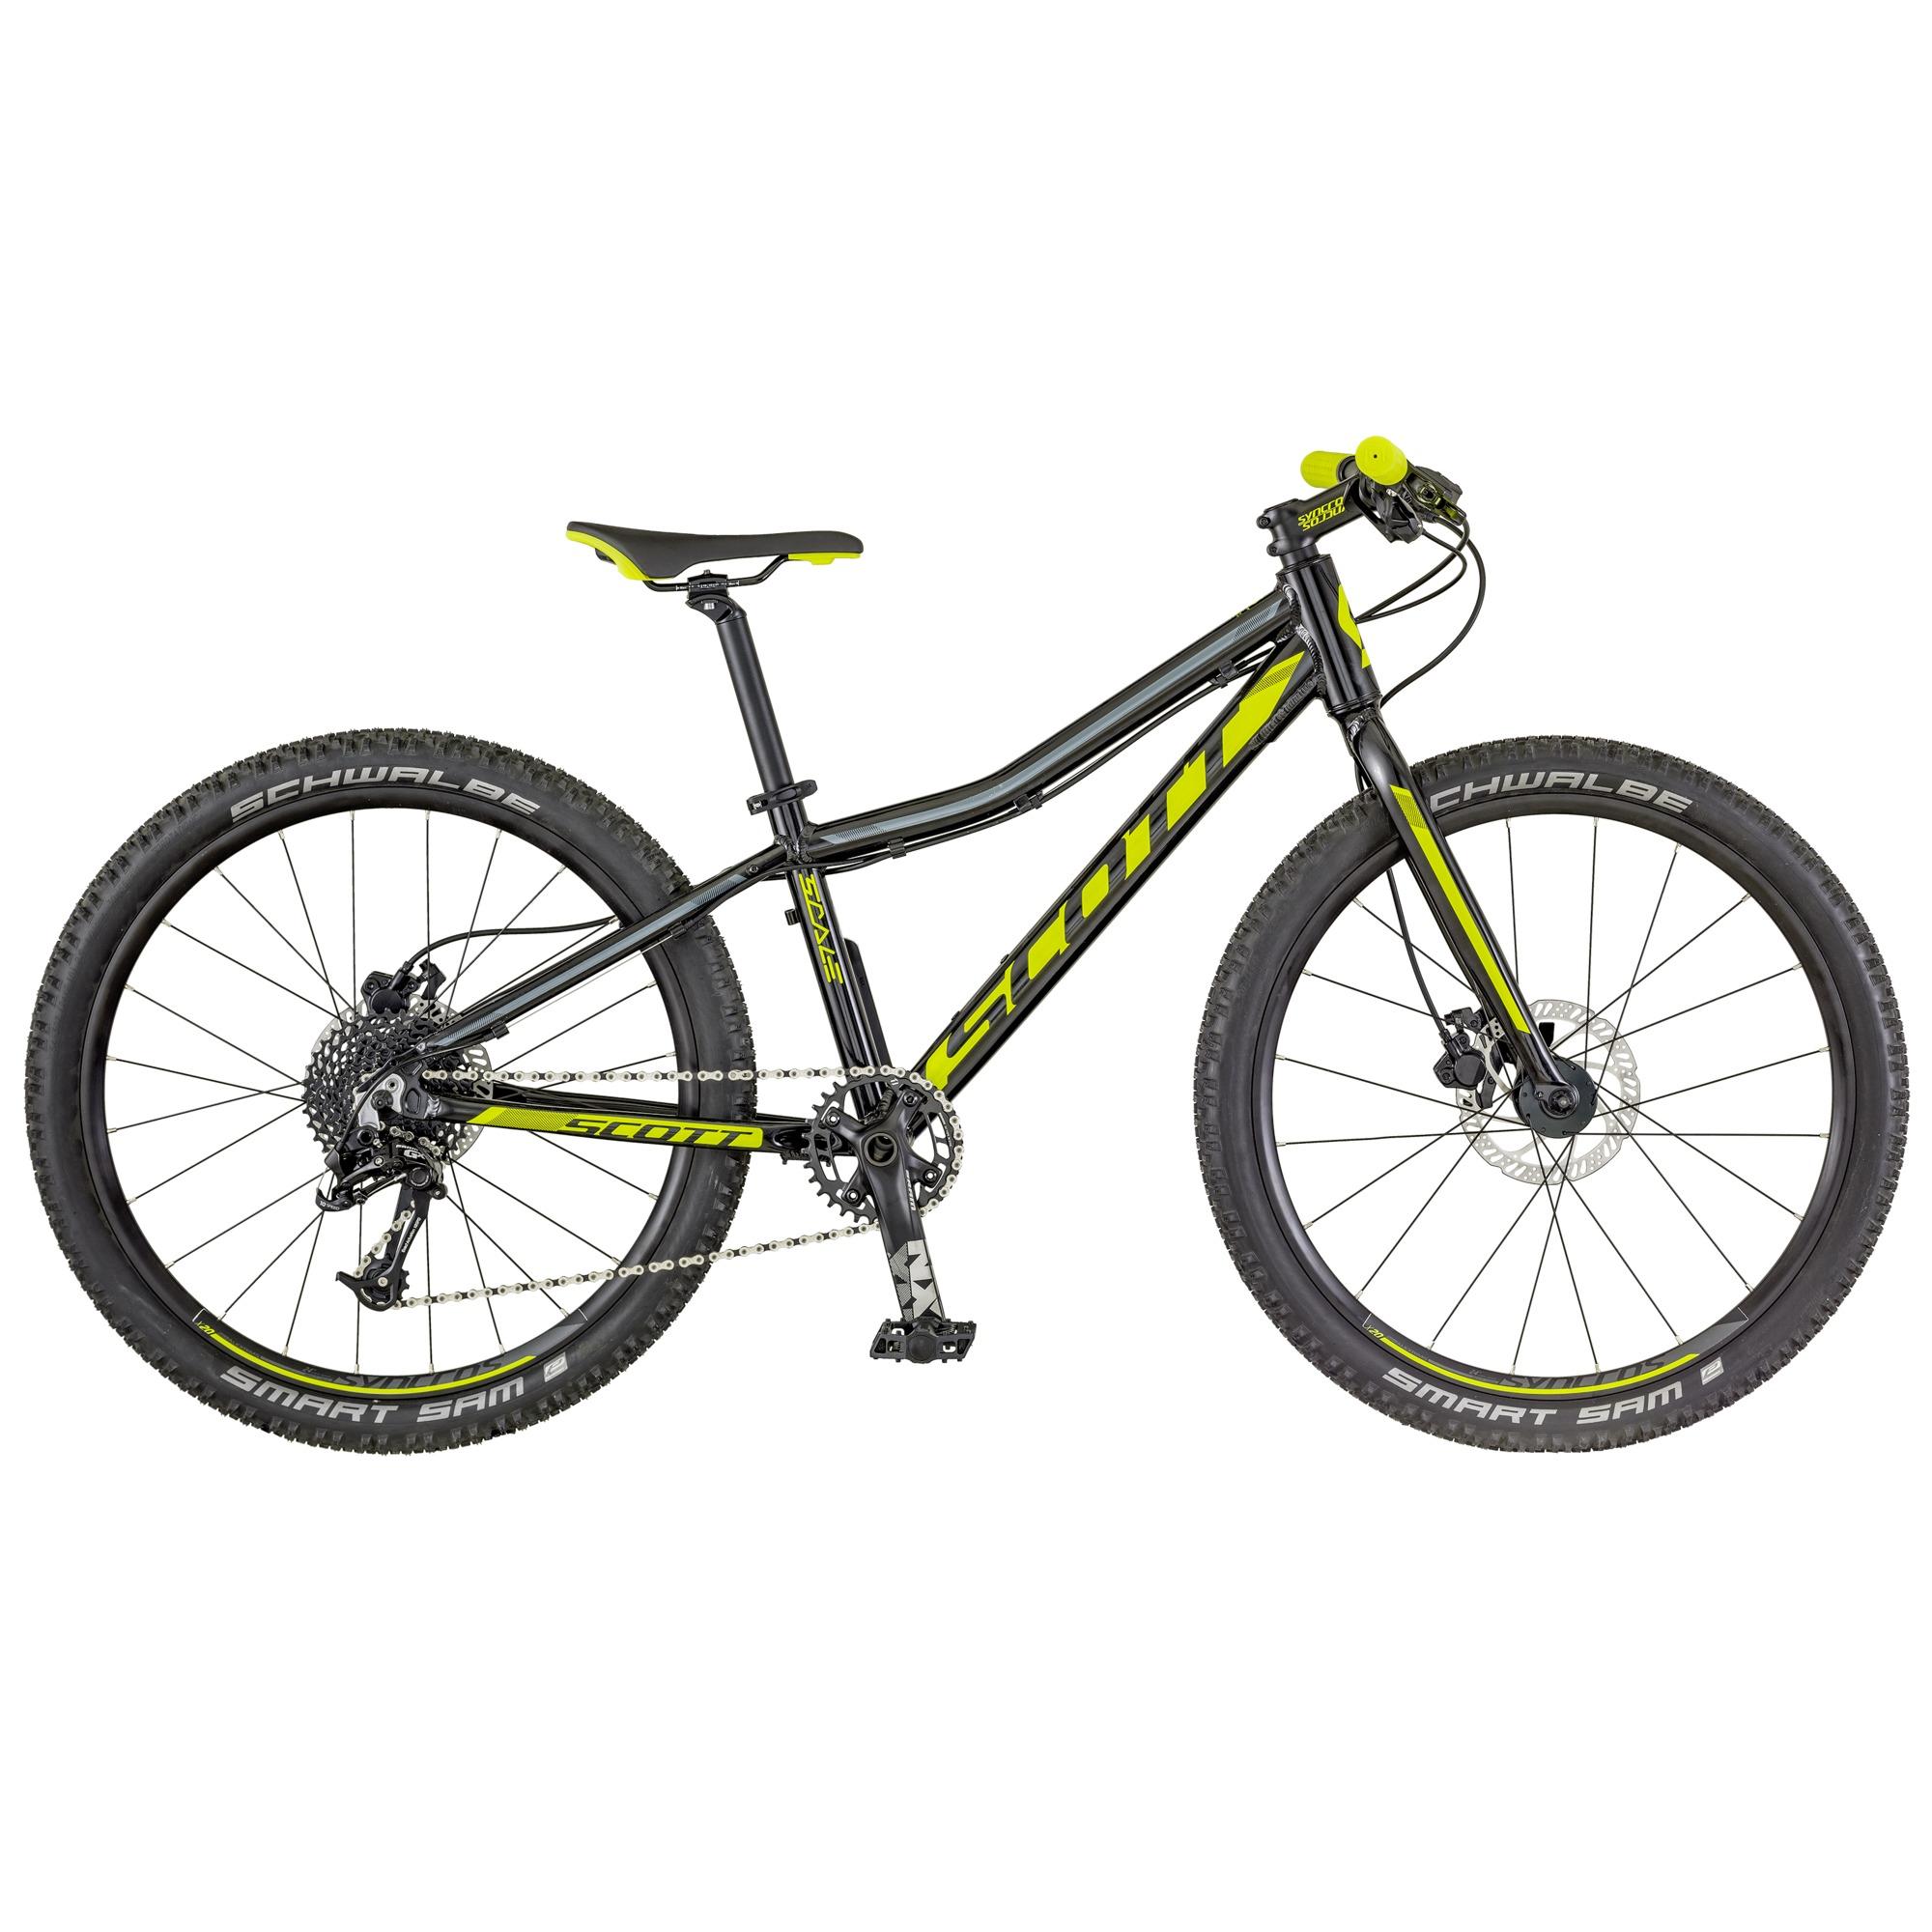 SCOTT Scale RC JR 24 Disc Bike 24